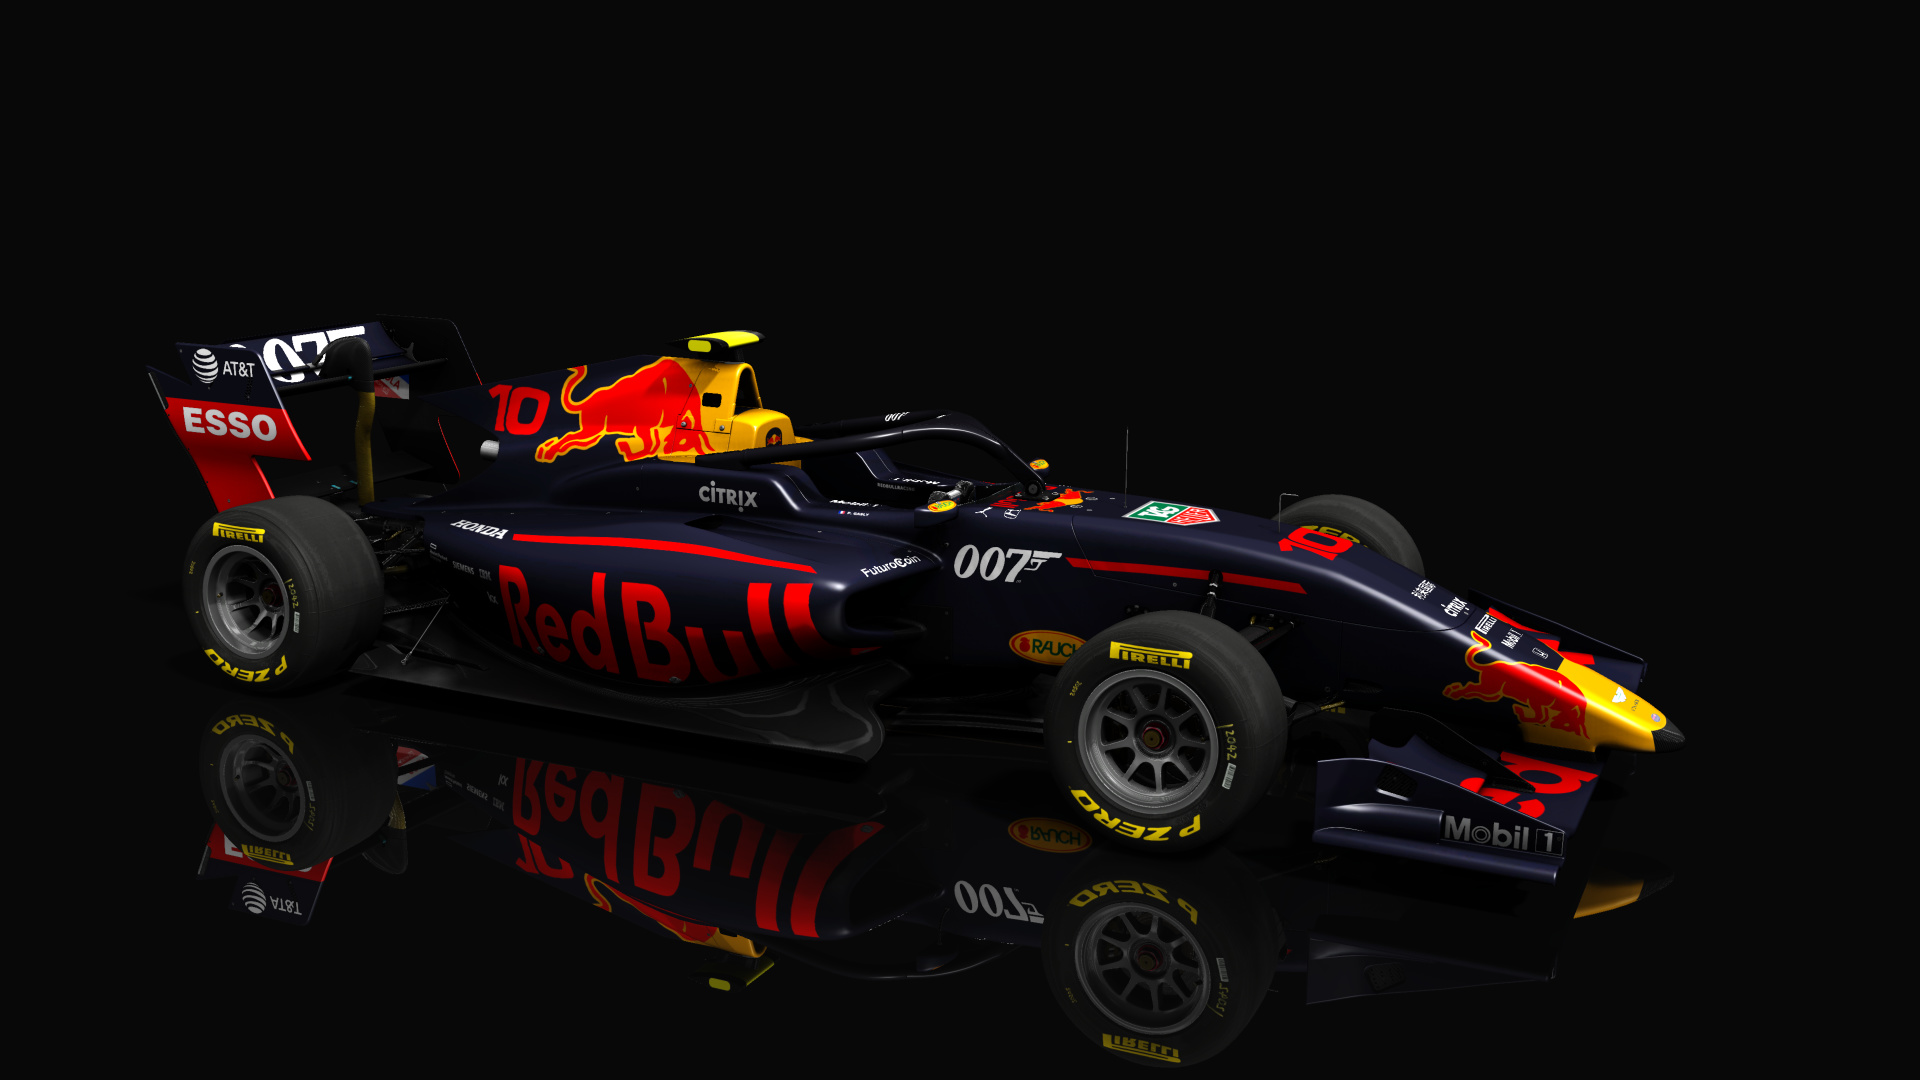 Formula Rss 3 Aston Martin Red Bull Racing 007 Racedepartment